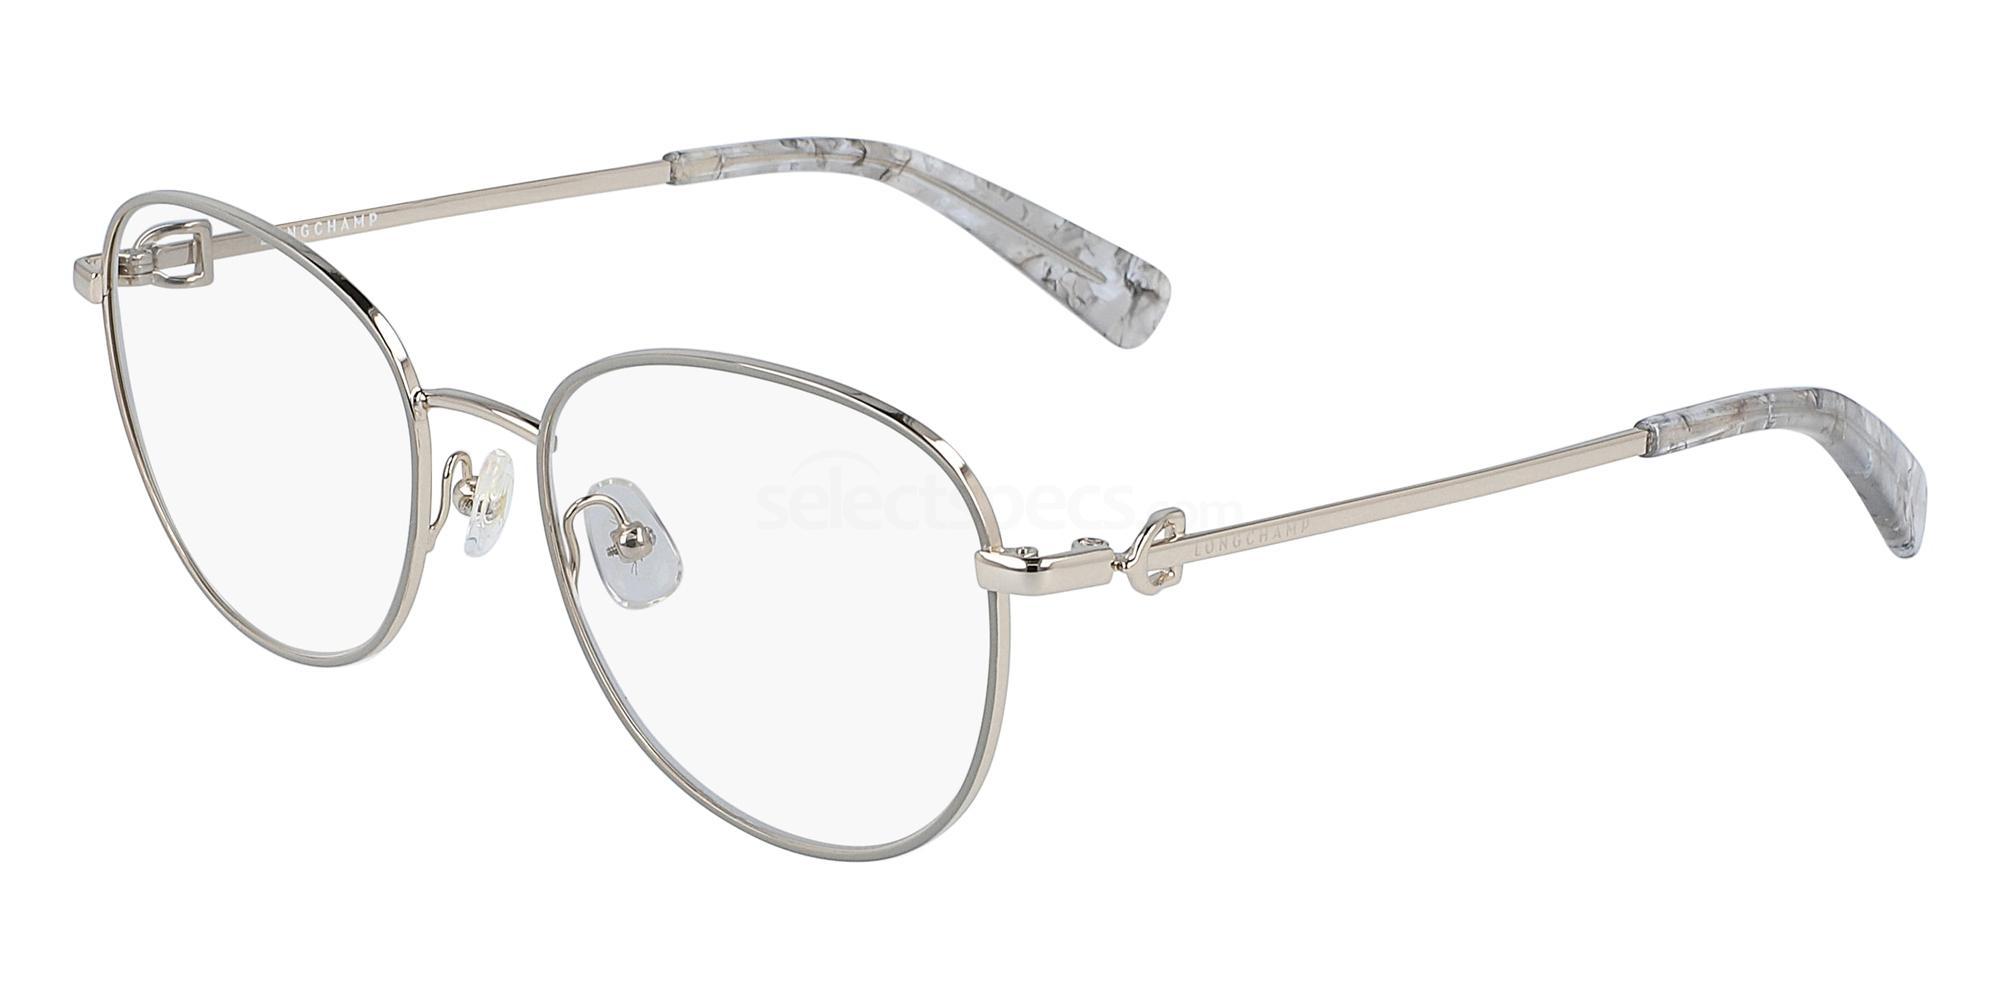 035 LO2127 Glasses, LONGCHAMP